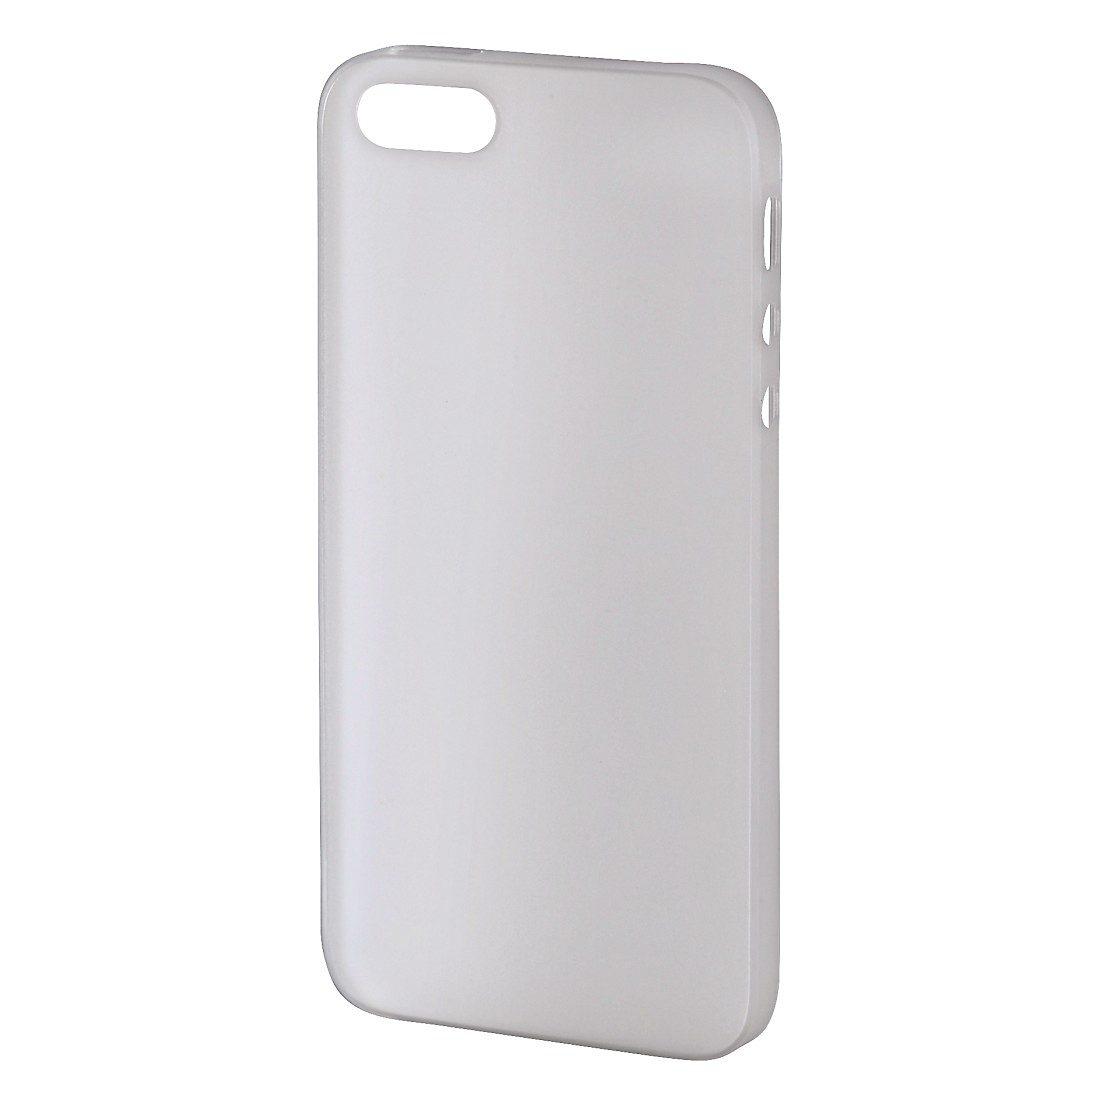 Hama Handy-Cover Ultra Slim für Apple iPhone 5/5s/SE, Weiß